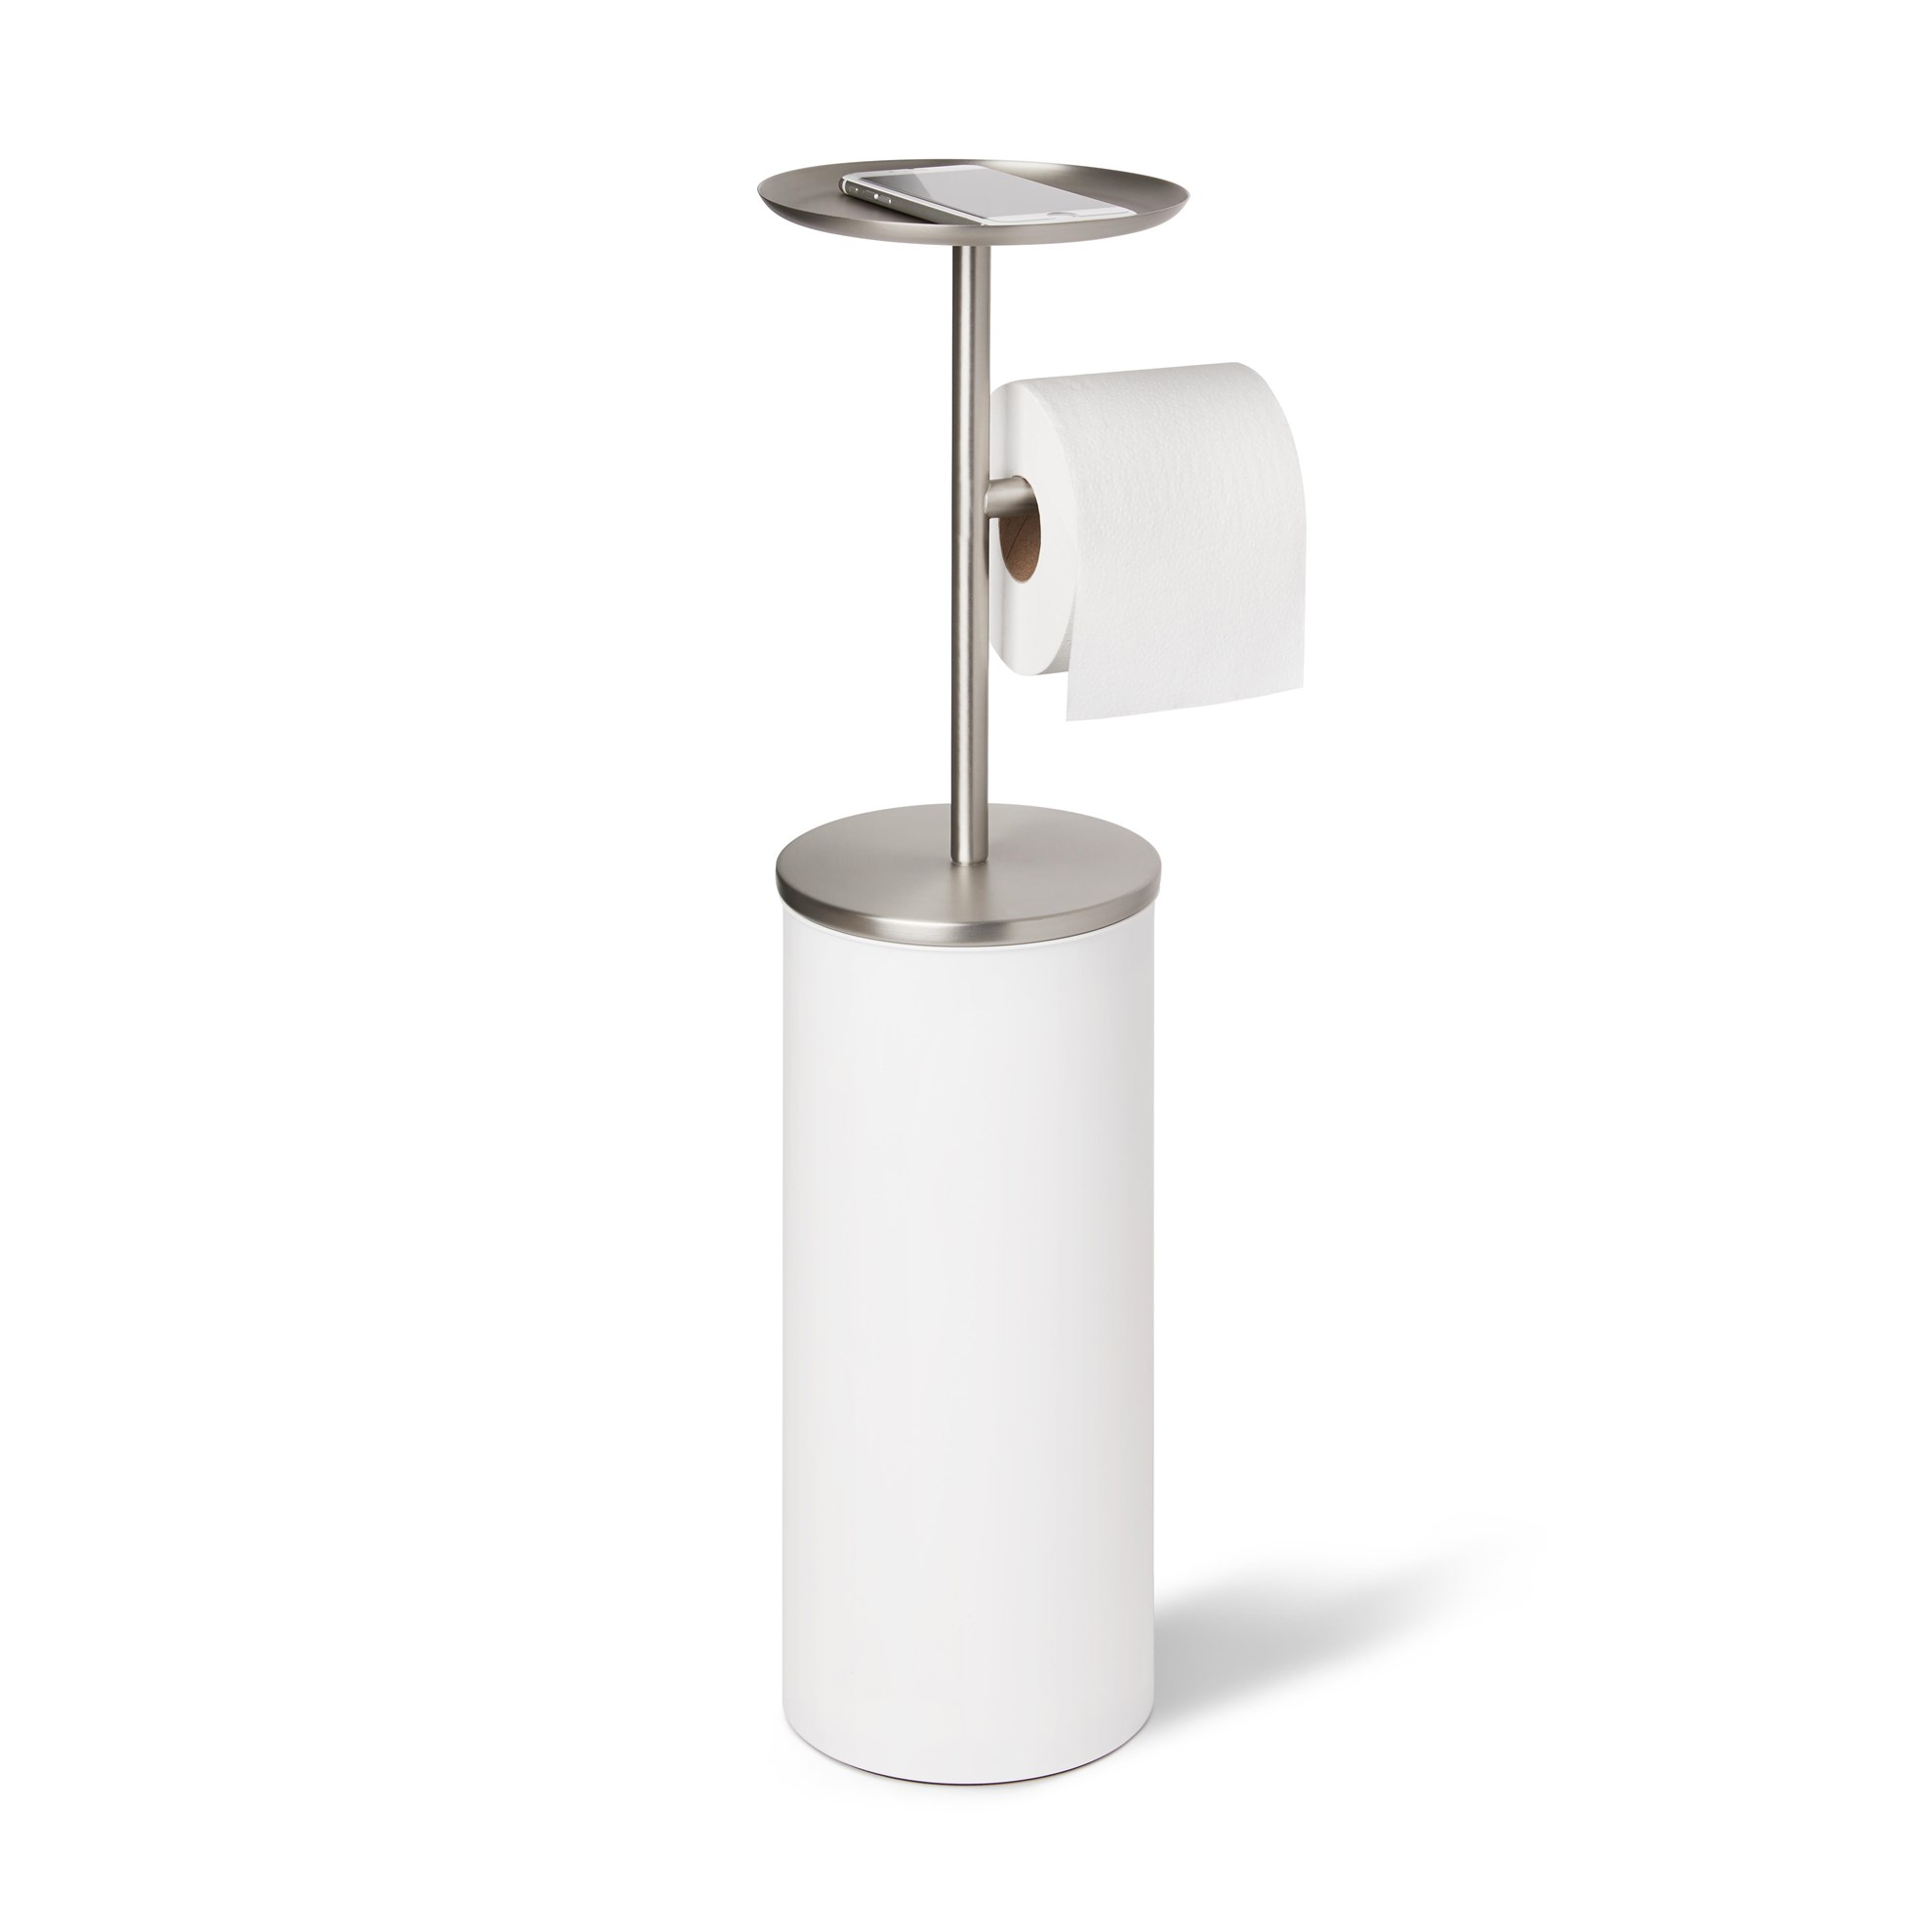 Držák na toaletní papír PORTALOO - bílá/nikl_0